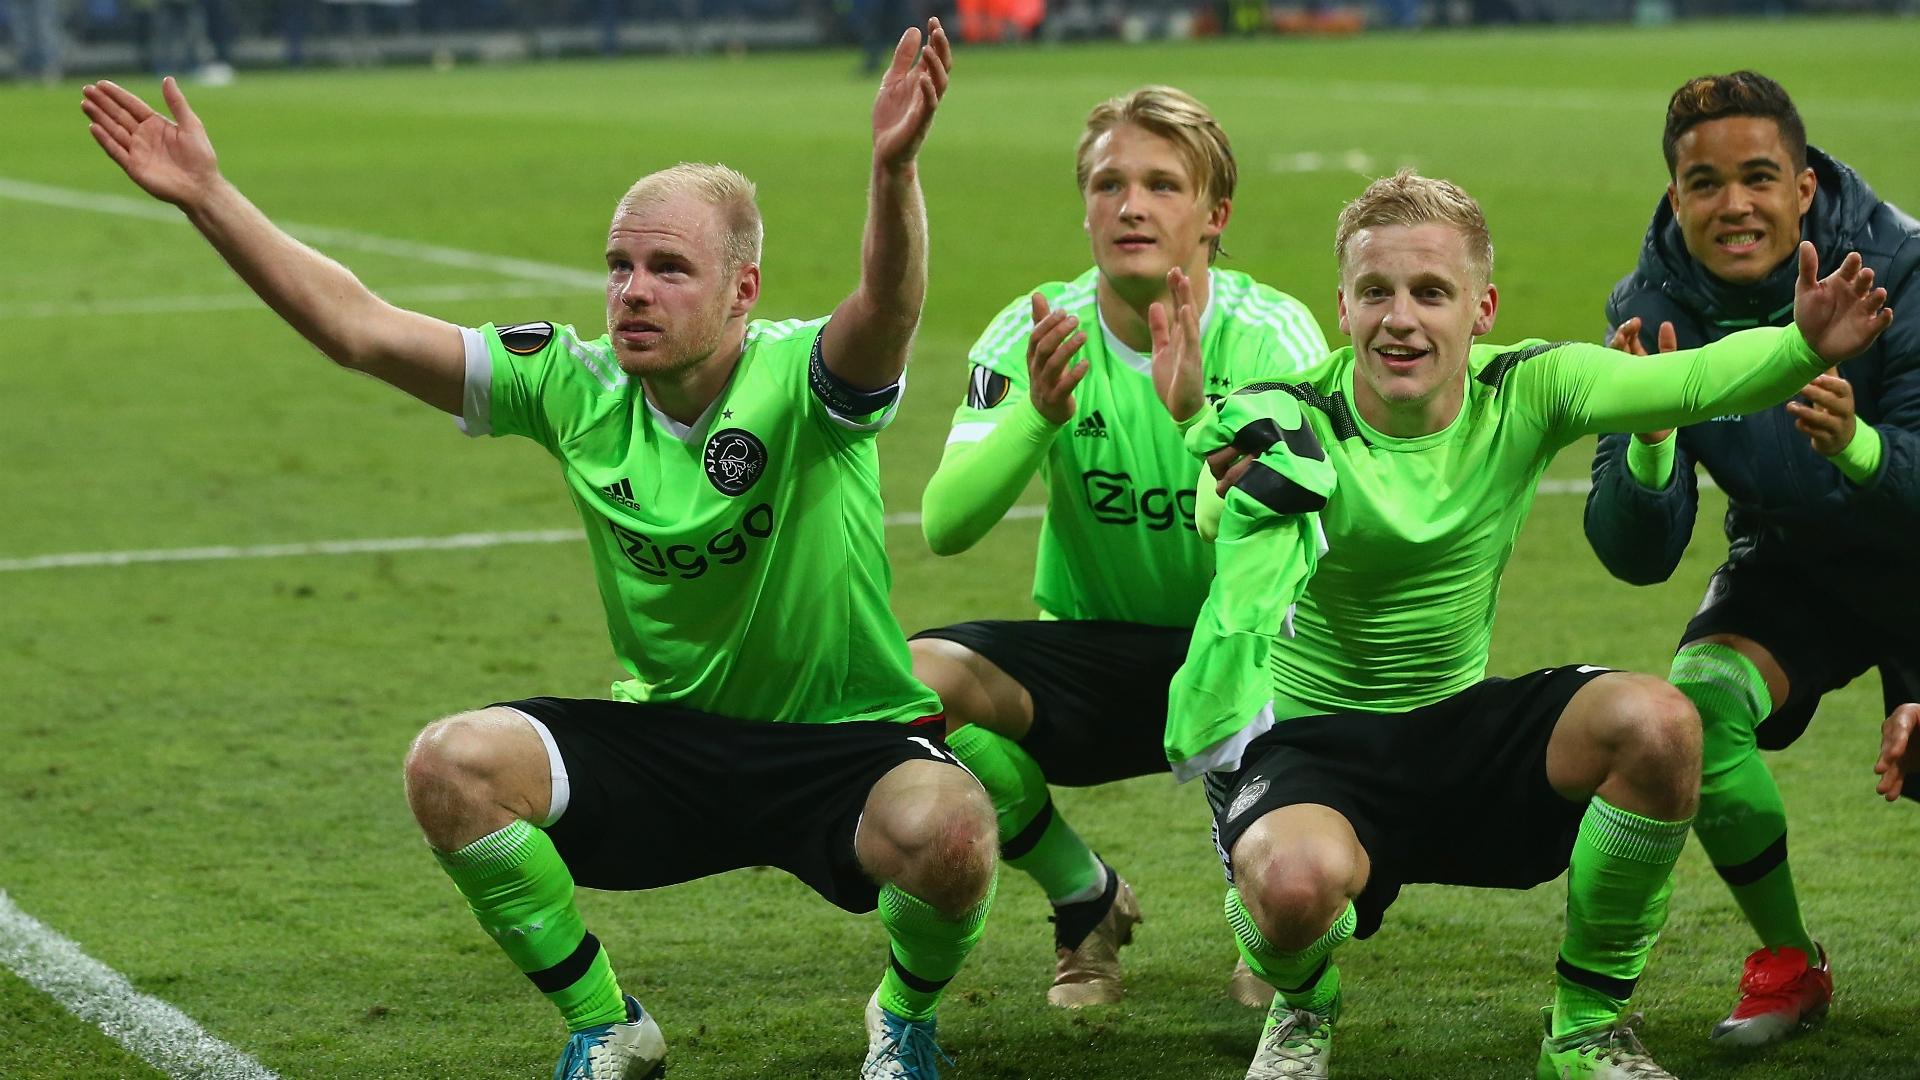 Klaassen was part of Ajax's impressive side that reached the Europa League final this season